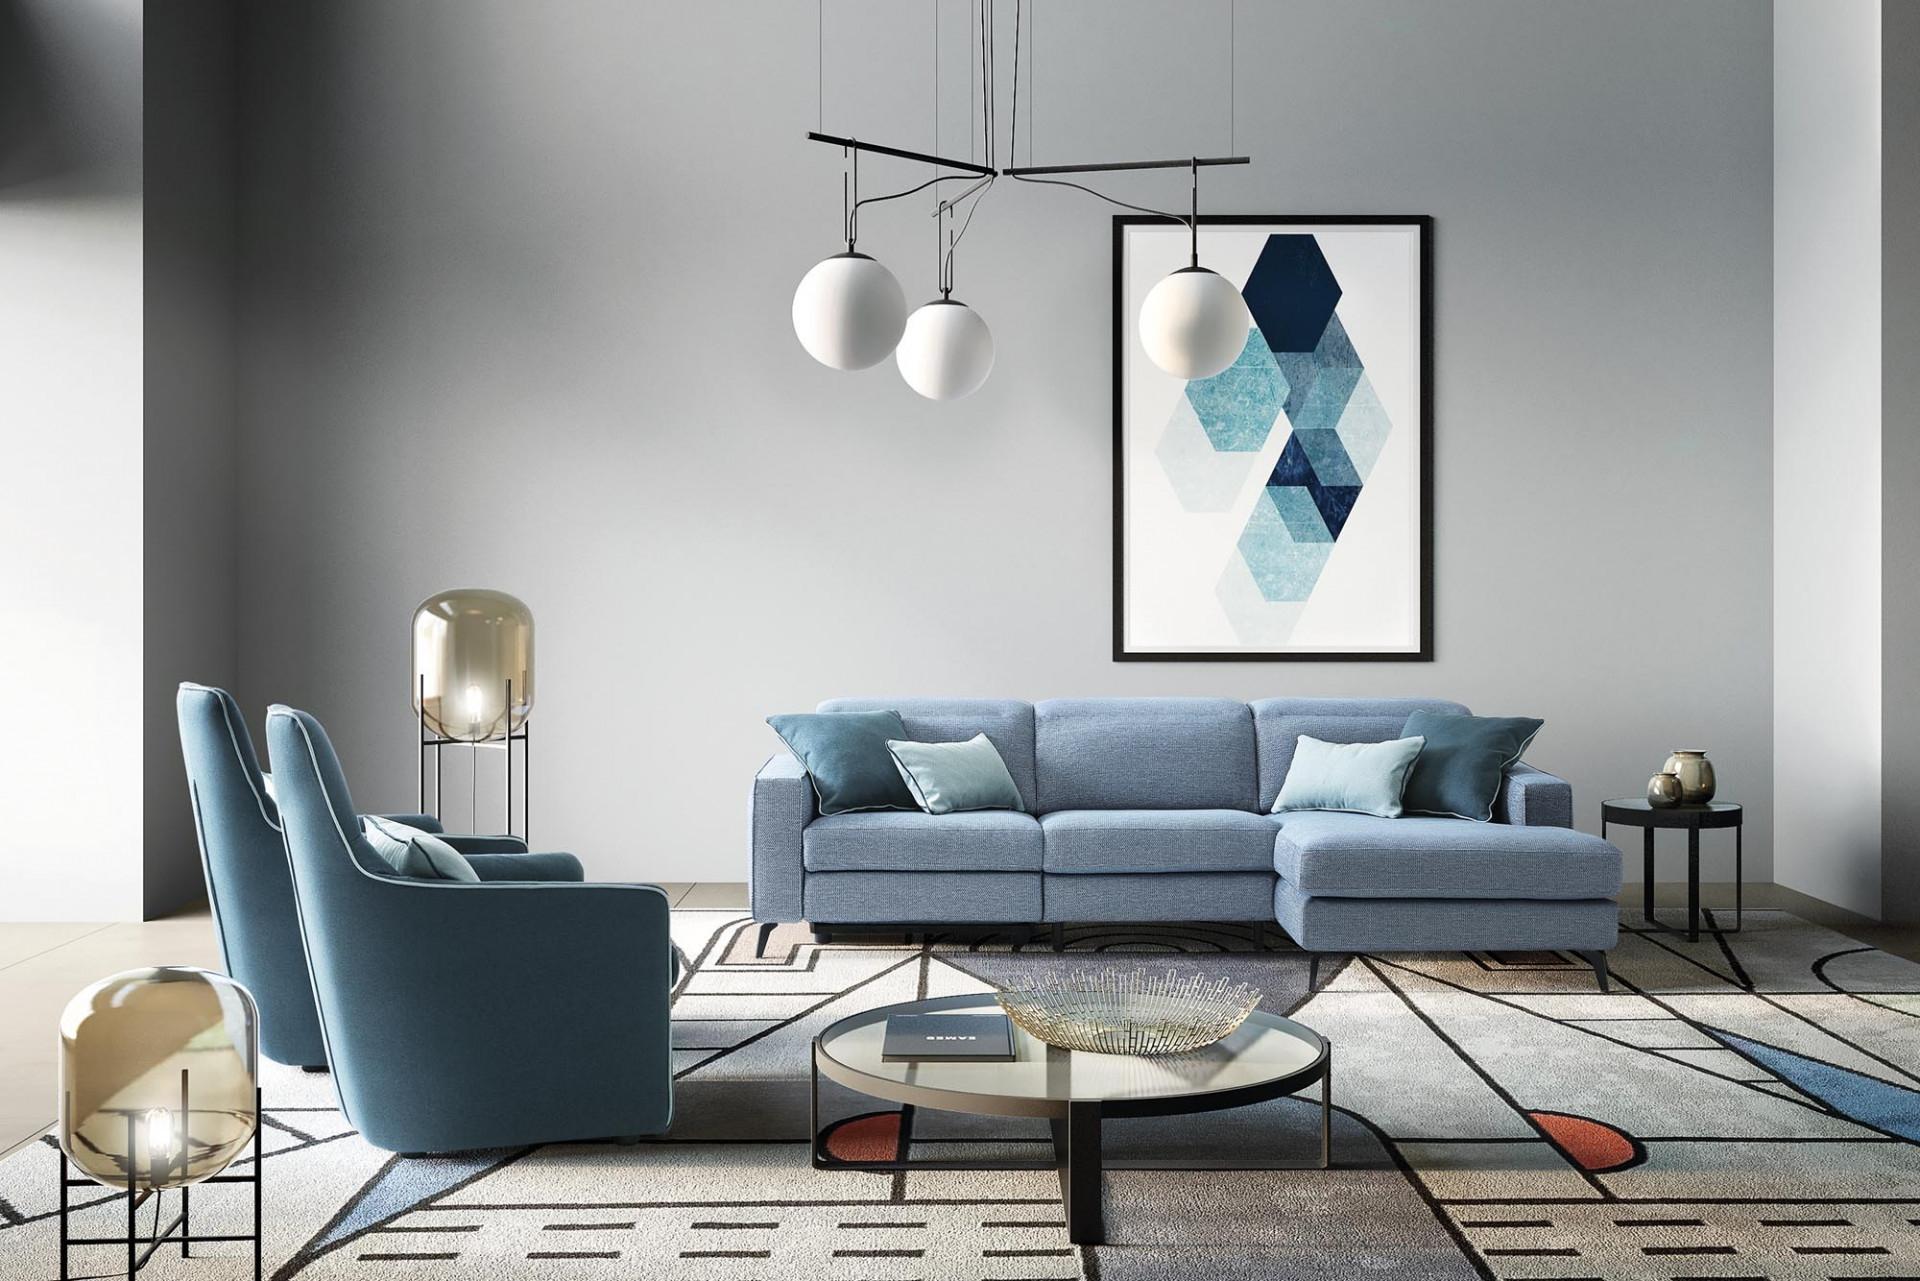 Coltar fix cu mecanism Relax, cu sezlong pe dreapta, tapitat cu stofa, Christopher Albastru, l275xA158xH78 cm